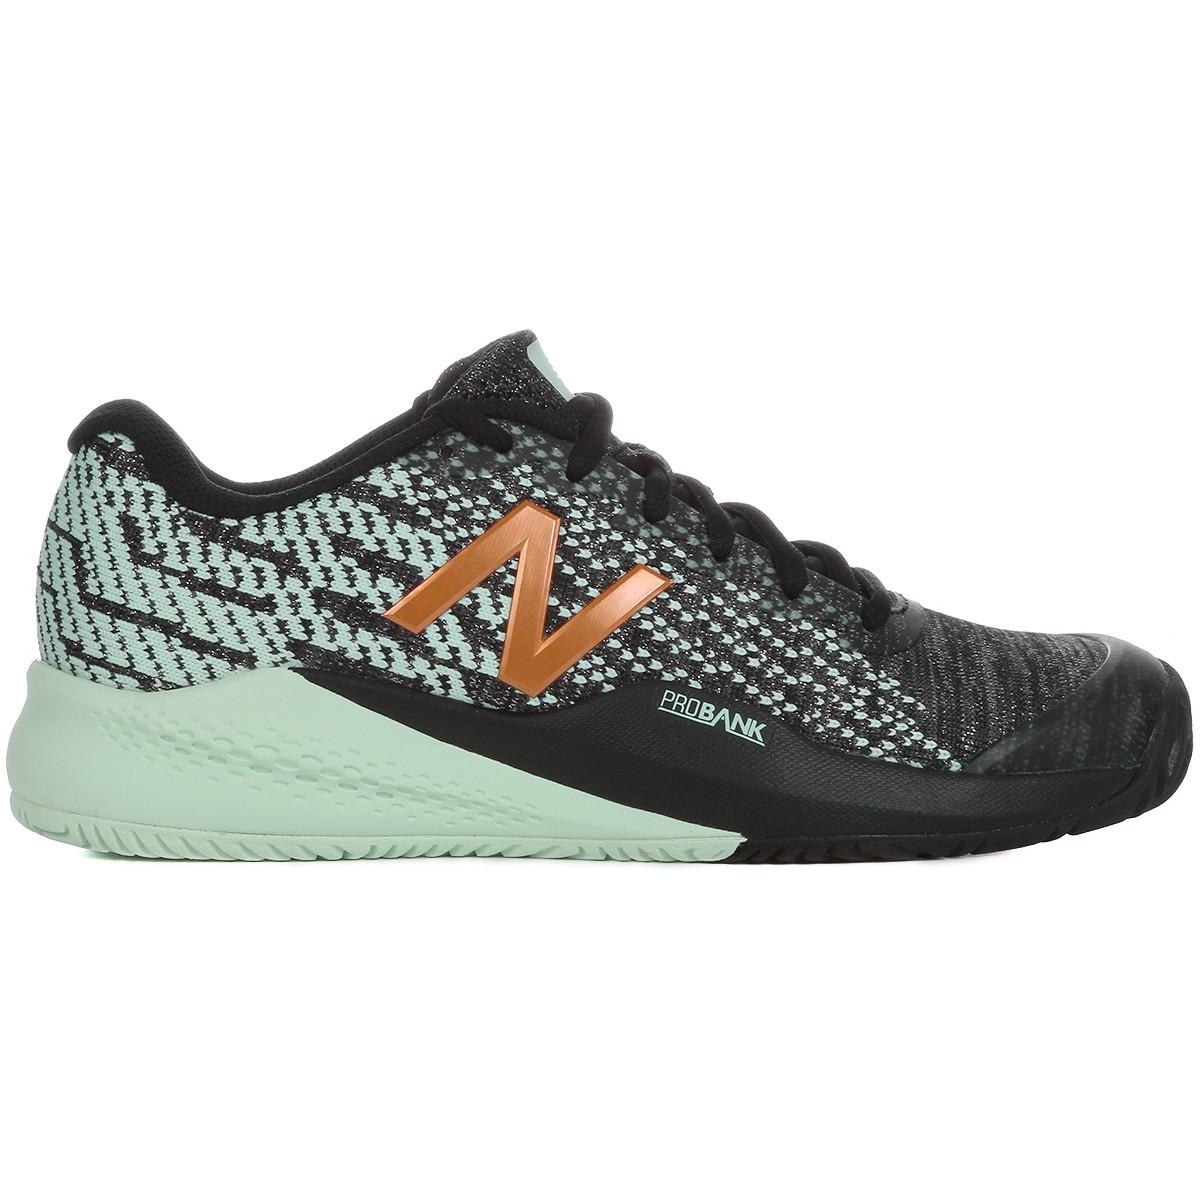 New Balance All Women's Exclusive Surfaces Shoes Wch996 35AjLcq4R